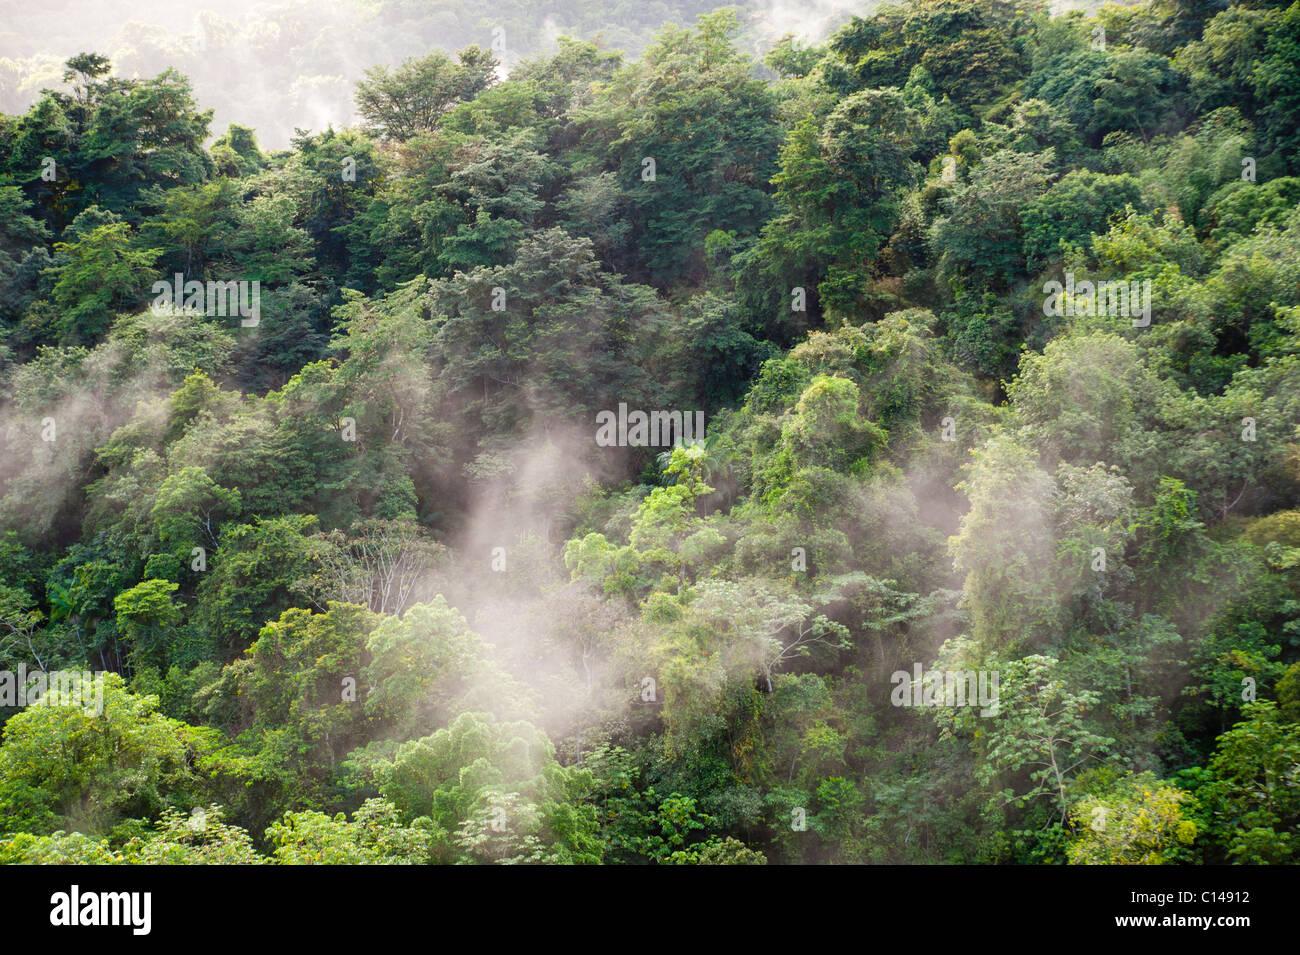 Forêt amazonienne, jungle, brume, tree tops, Banque D'Images